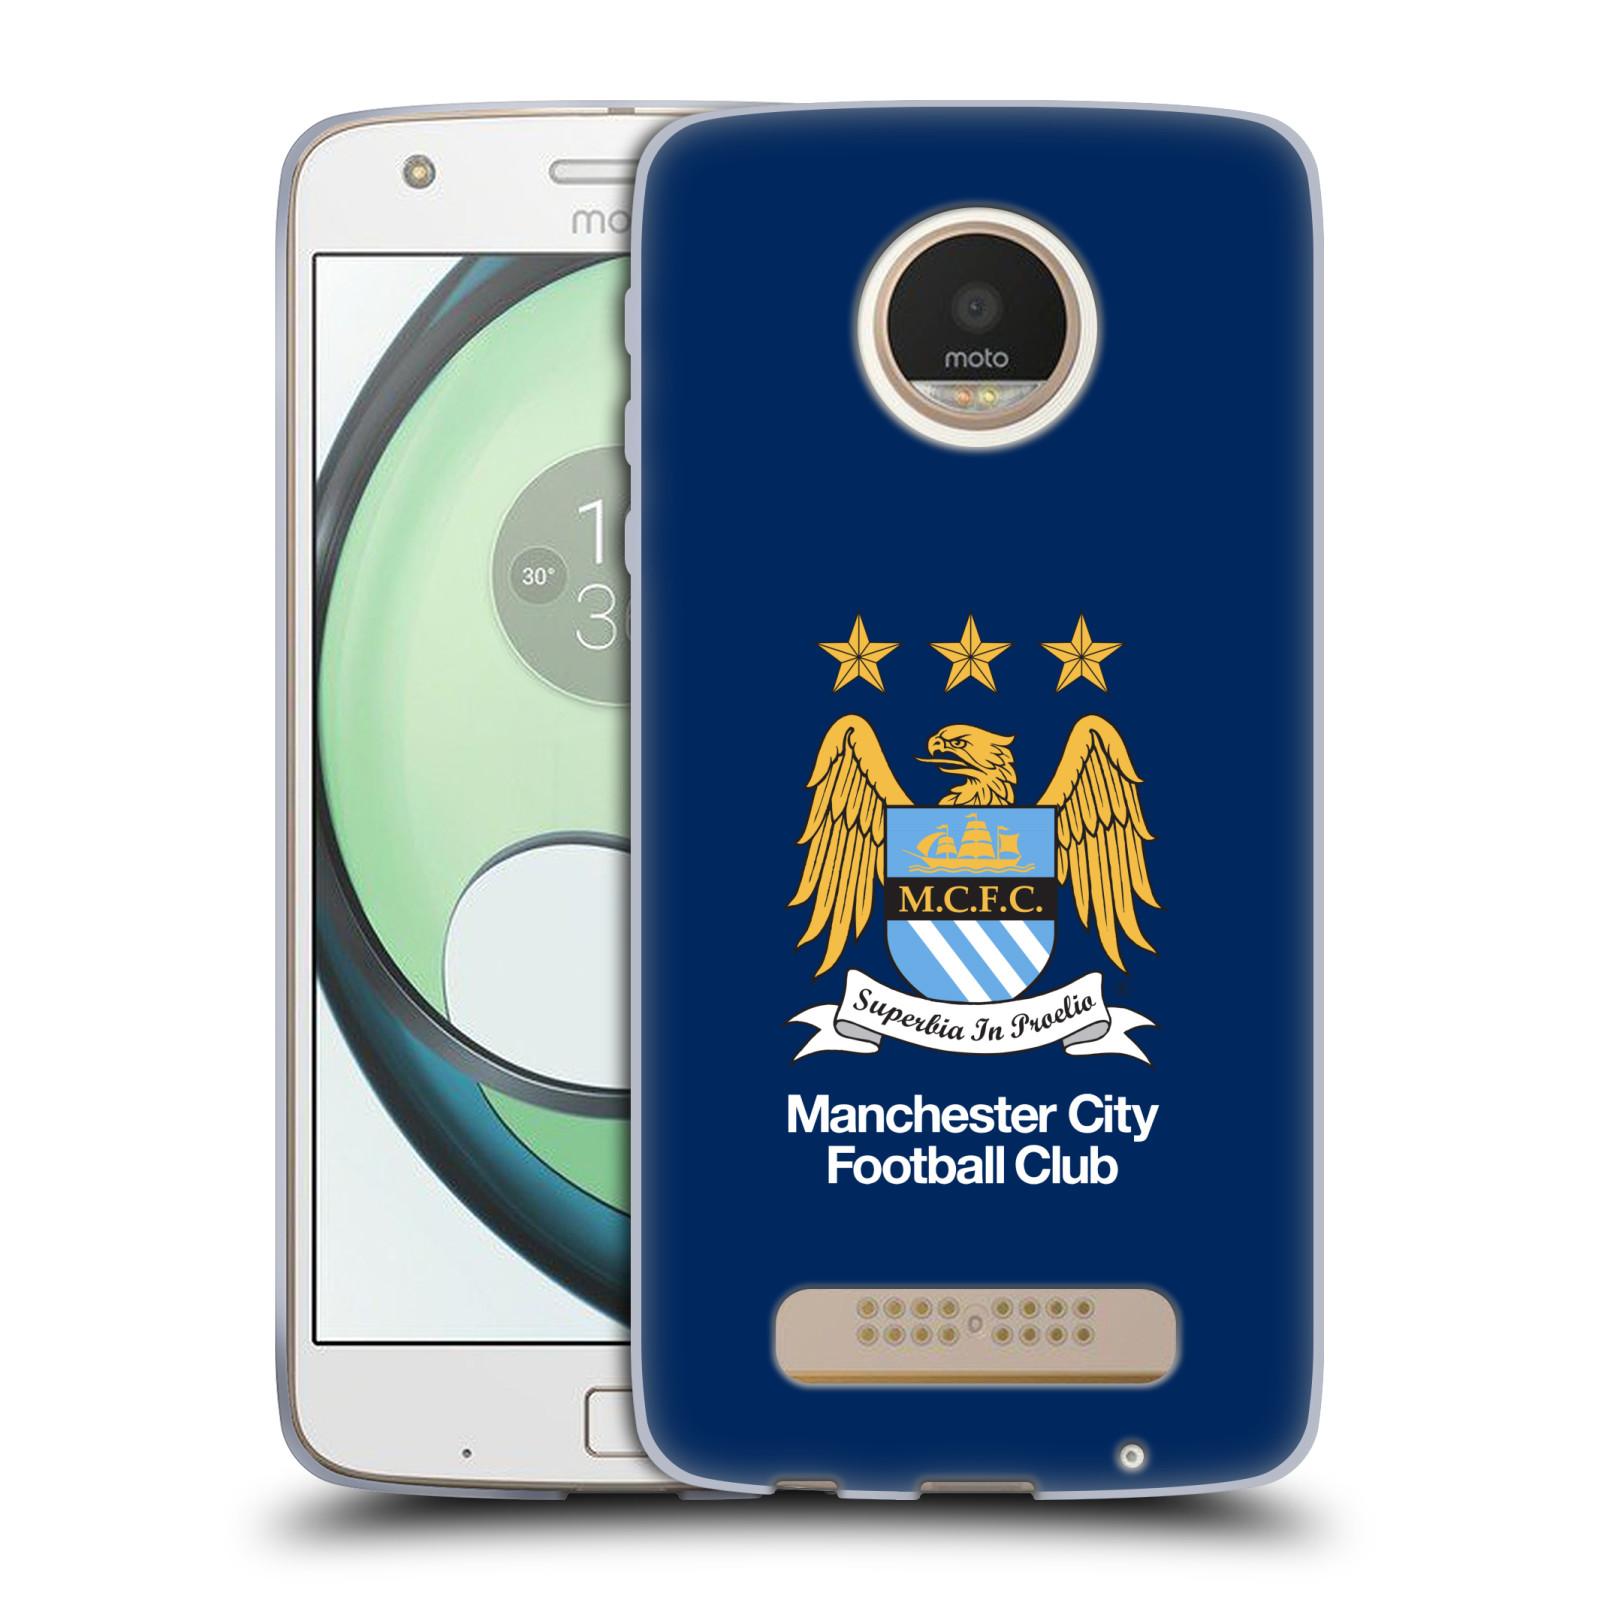 HEAD CASE silikonový obal na mobil Lenovo Moto Z PLAY Fotbalový klub Manchester City modré pozadí velký znak